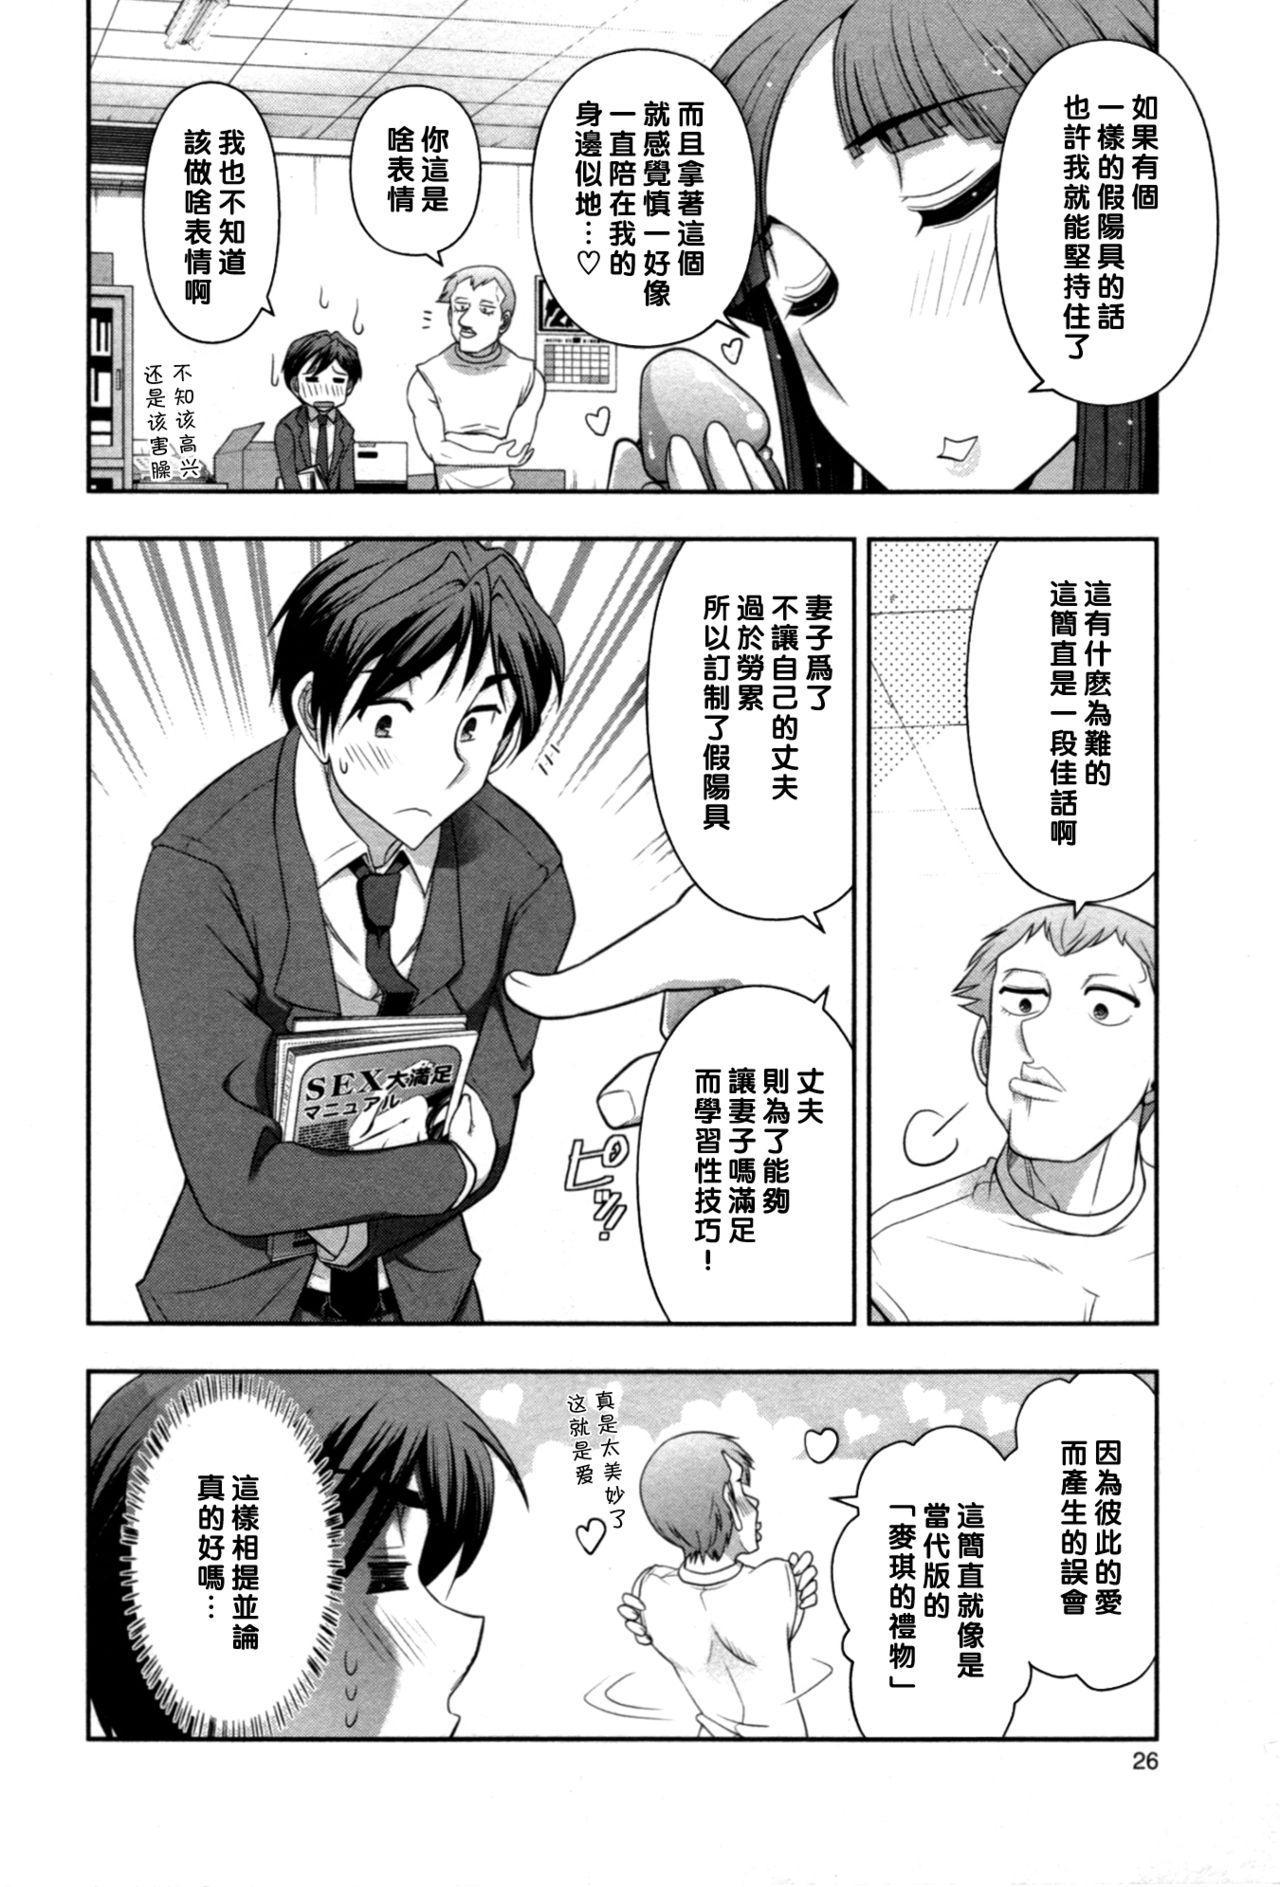 Haruko-san no Niizuma Recipe Ch. 2 11